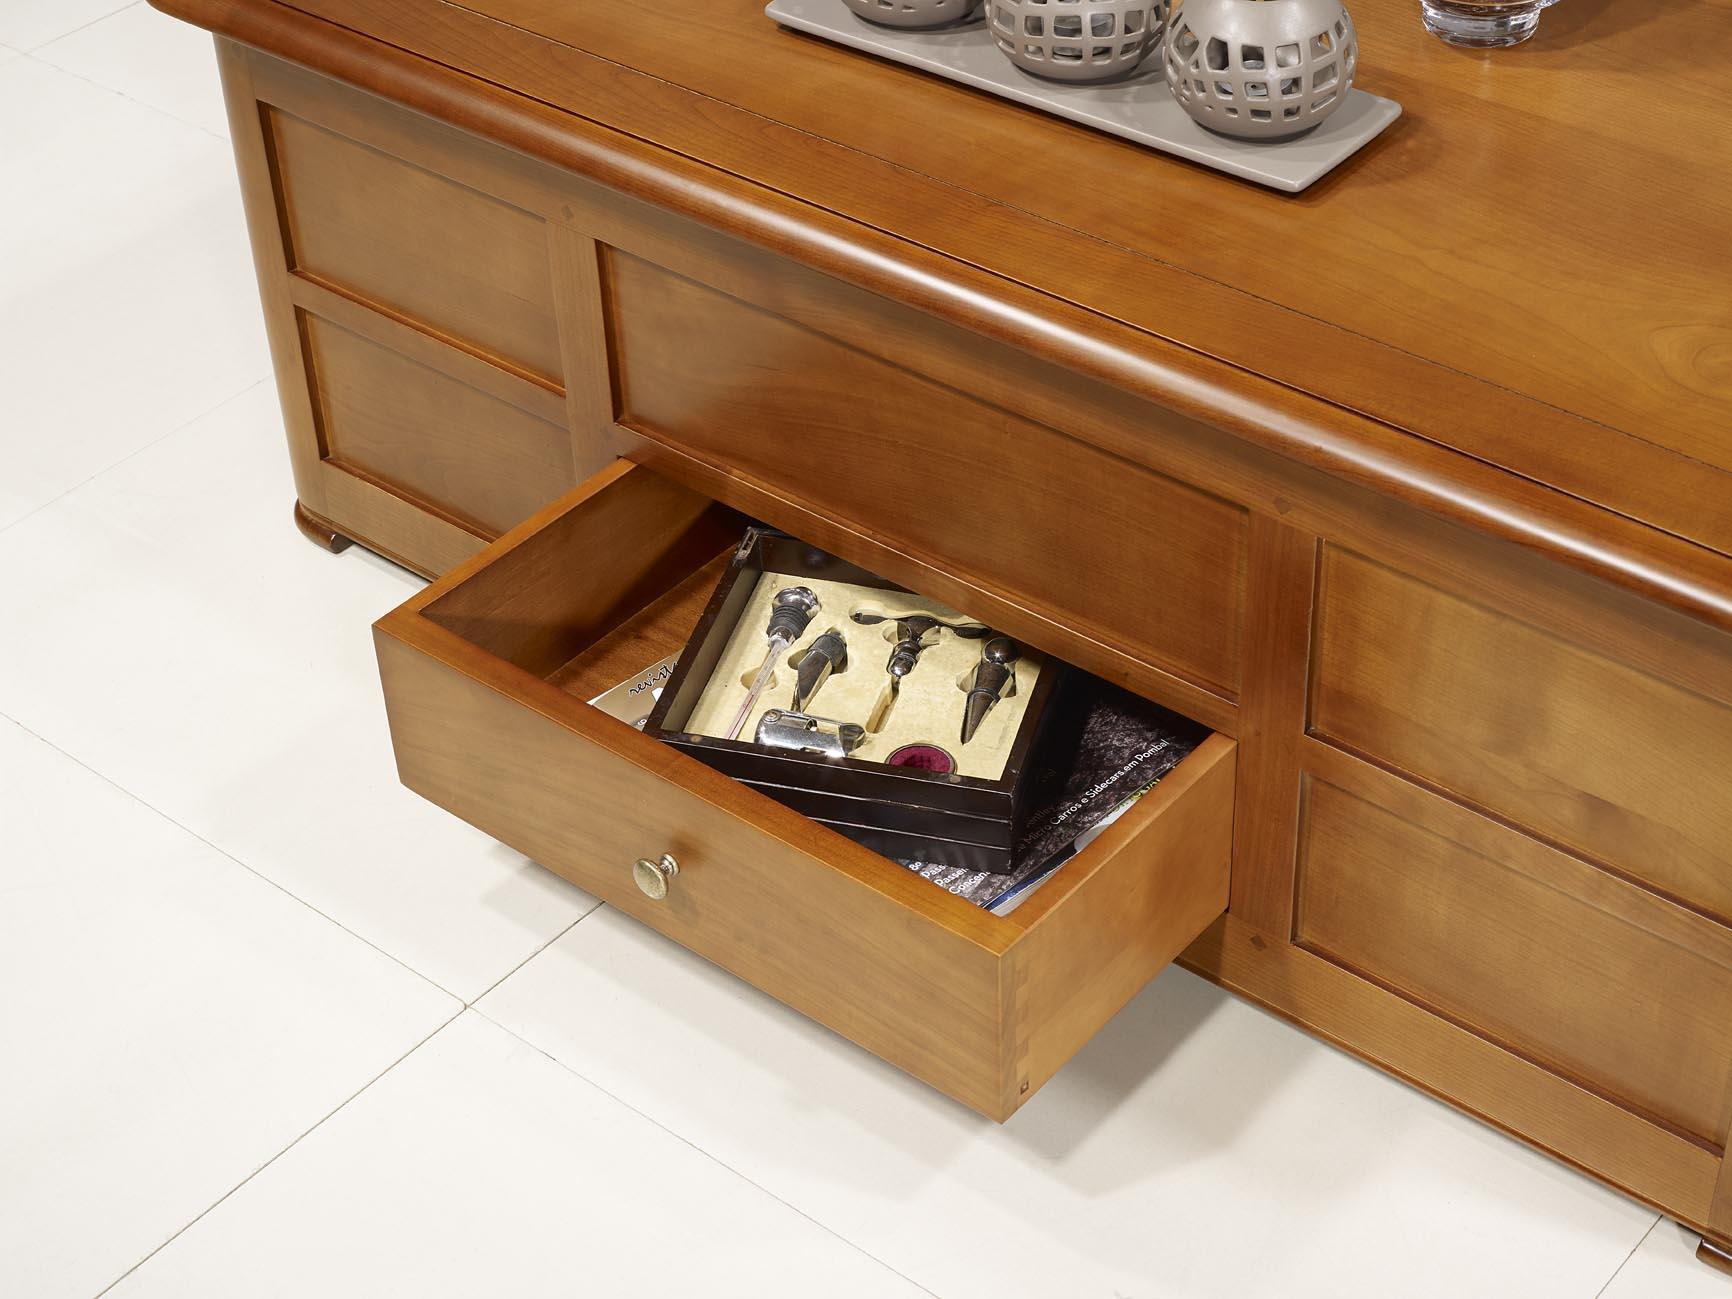 table basse bar ine en merisier de style louis philippe meuble en merisier massif. Black Bedroom Furniture Sets. Home Design Ideas